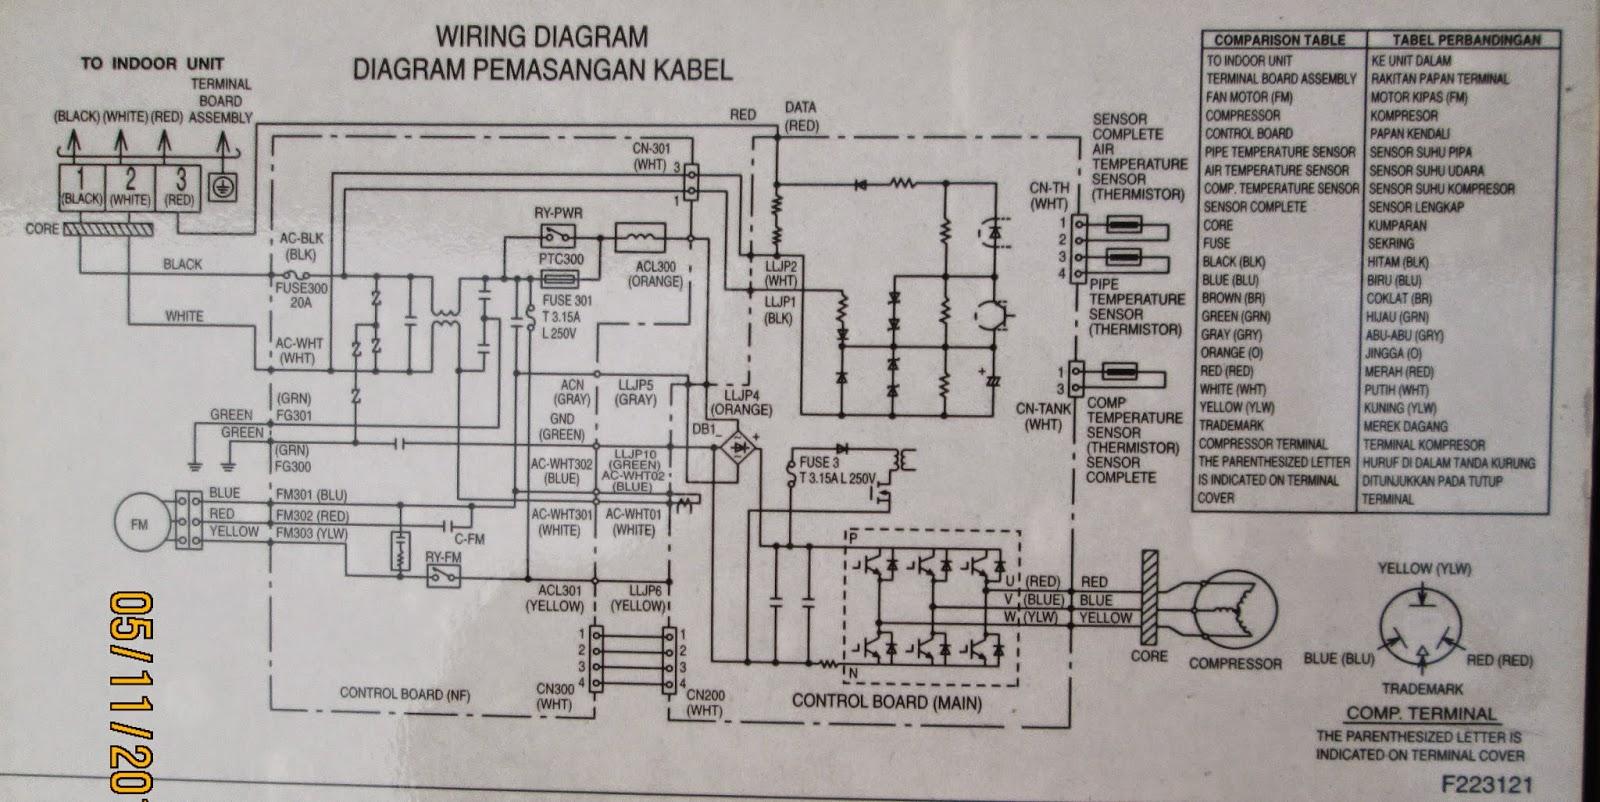 wiring diagram ac split inverter av plug service kota serang baru kelistrikan